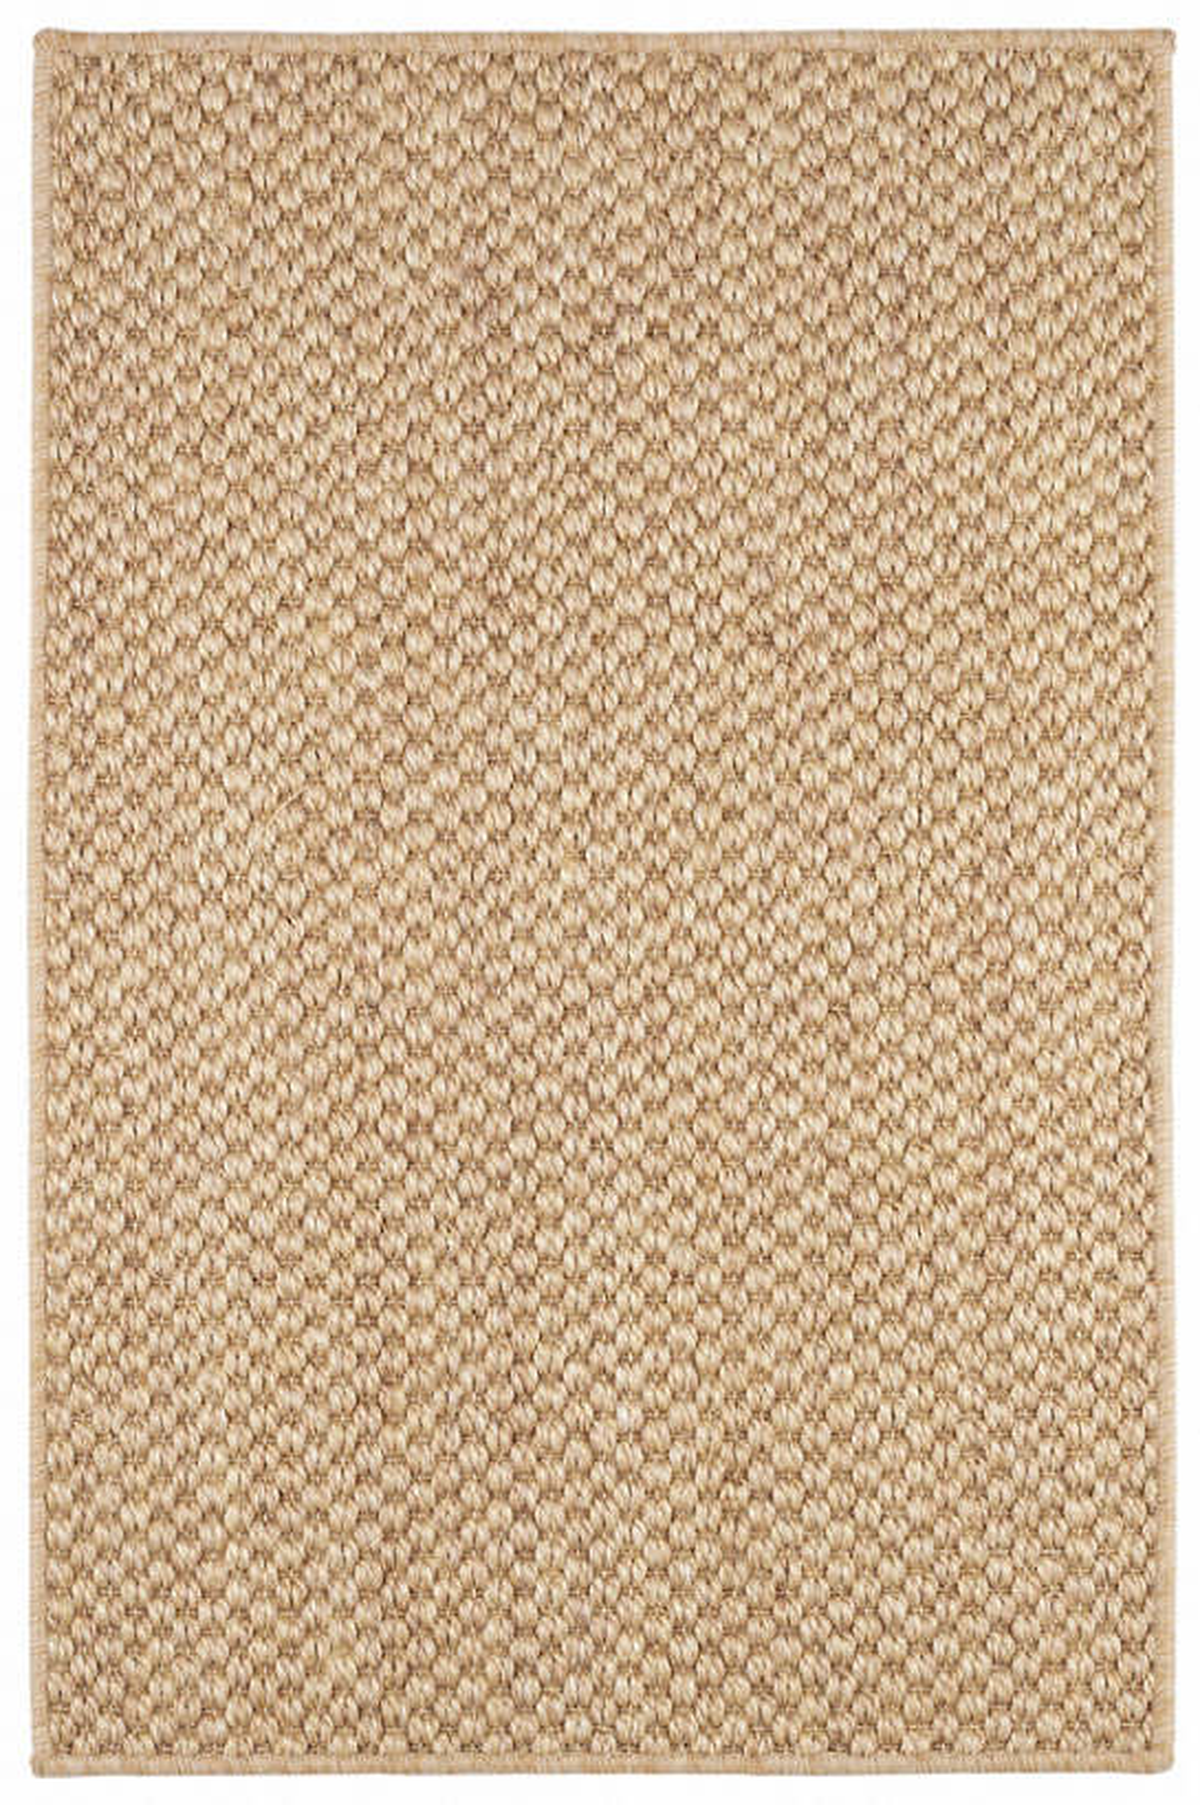 Corden Natural Woven Sisal Custom Rug